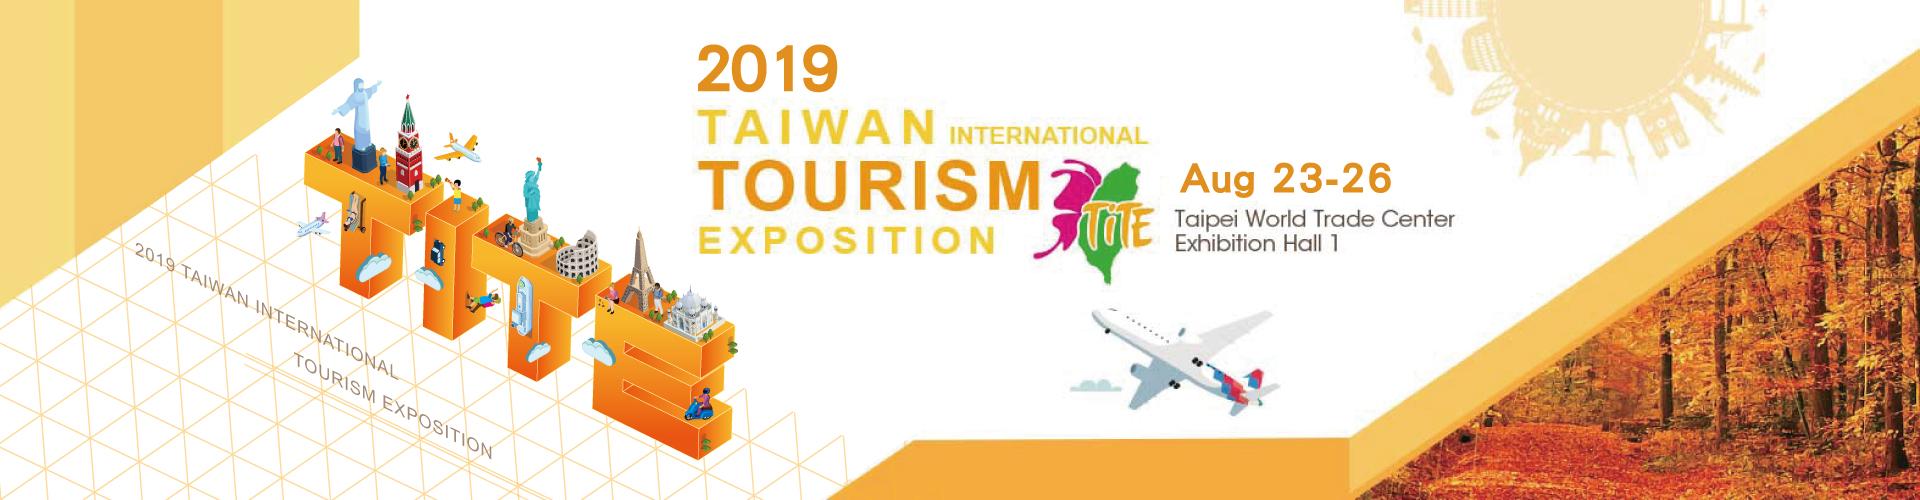 Taiwan International Tourism Exposition (TITE)